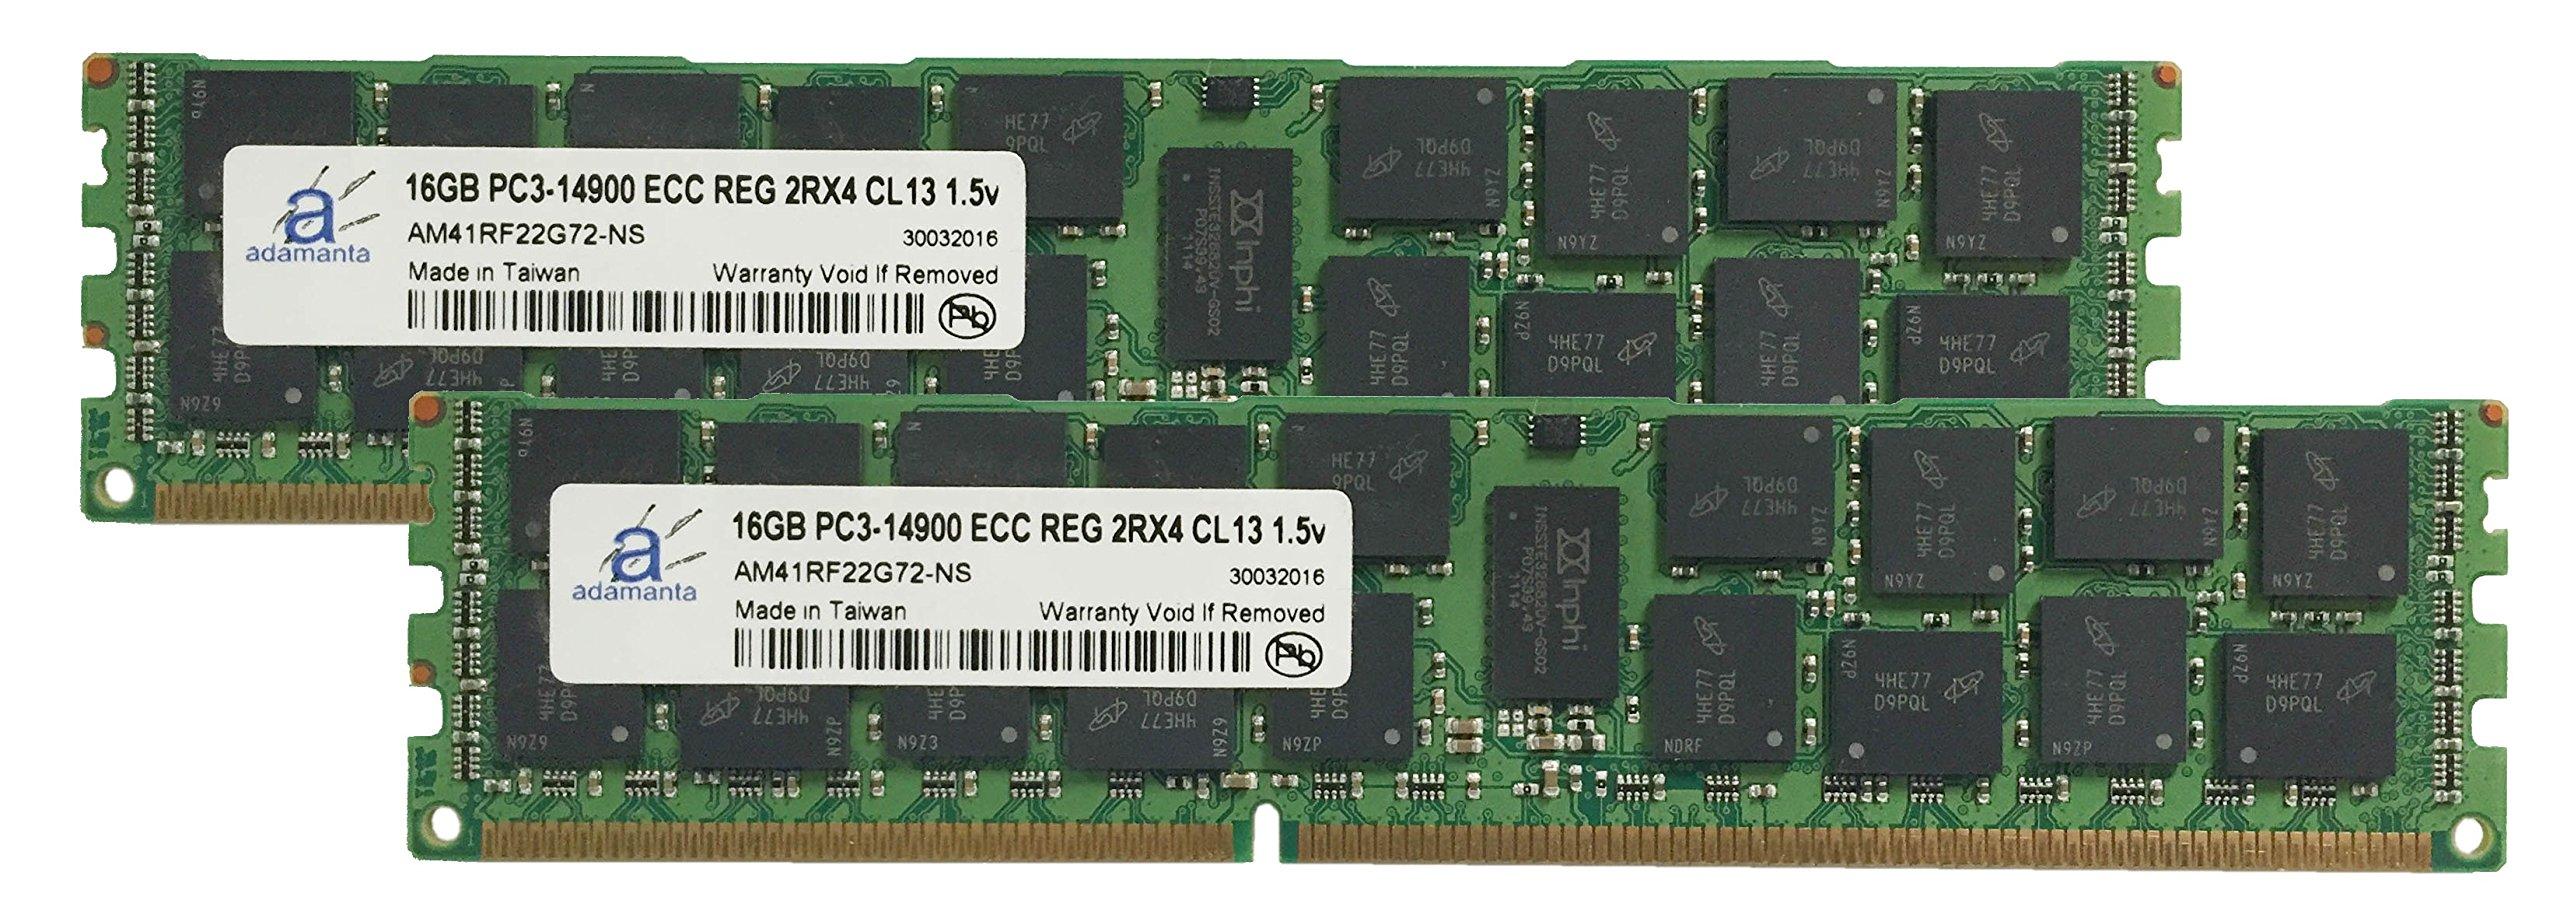 Adamanta 32GB (2x16GB) Server Memory Upgrade for Dell PowerEdge T620 DDR3 1866Mhz PC3-14900 ECC Registered 2Rx4 CL13 1.5v by Adamanta Memory